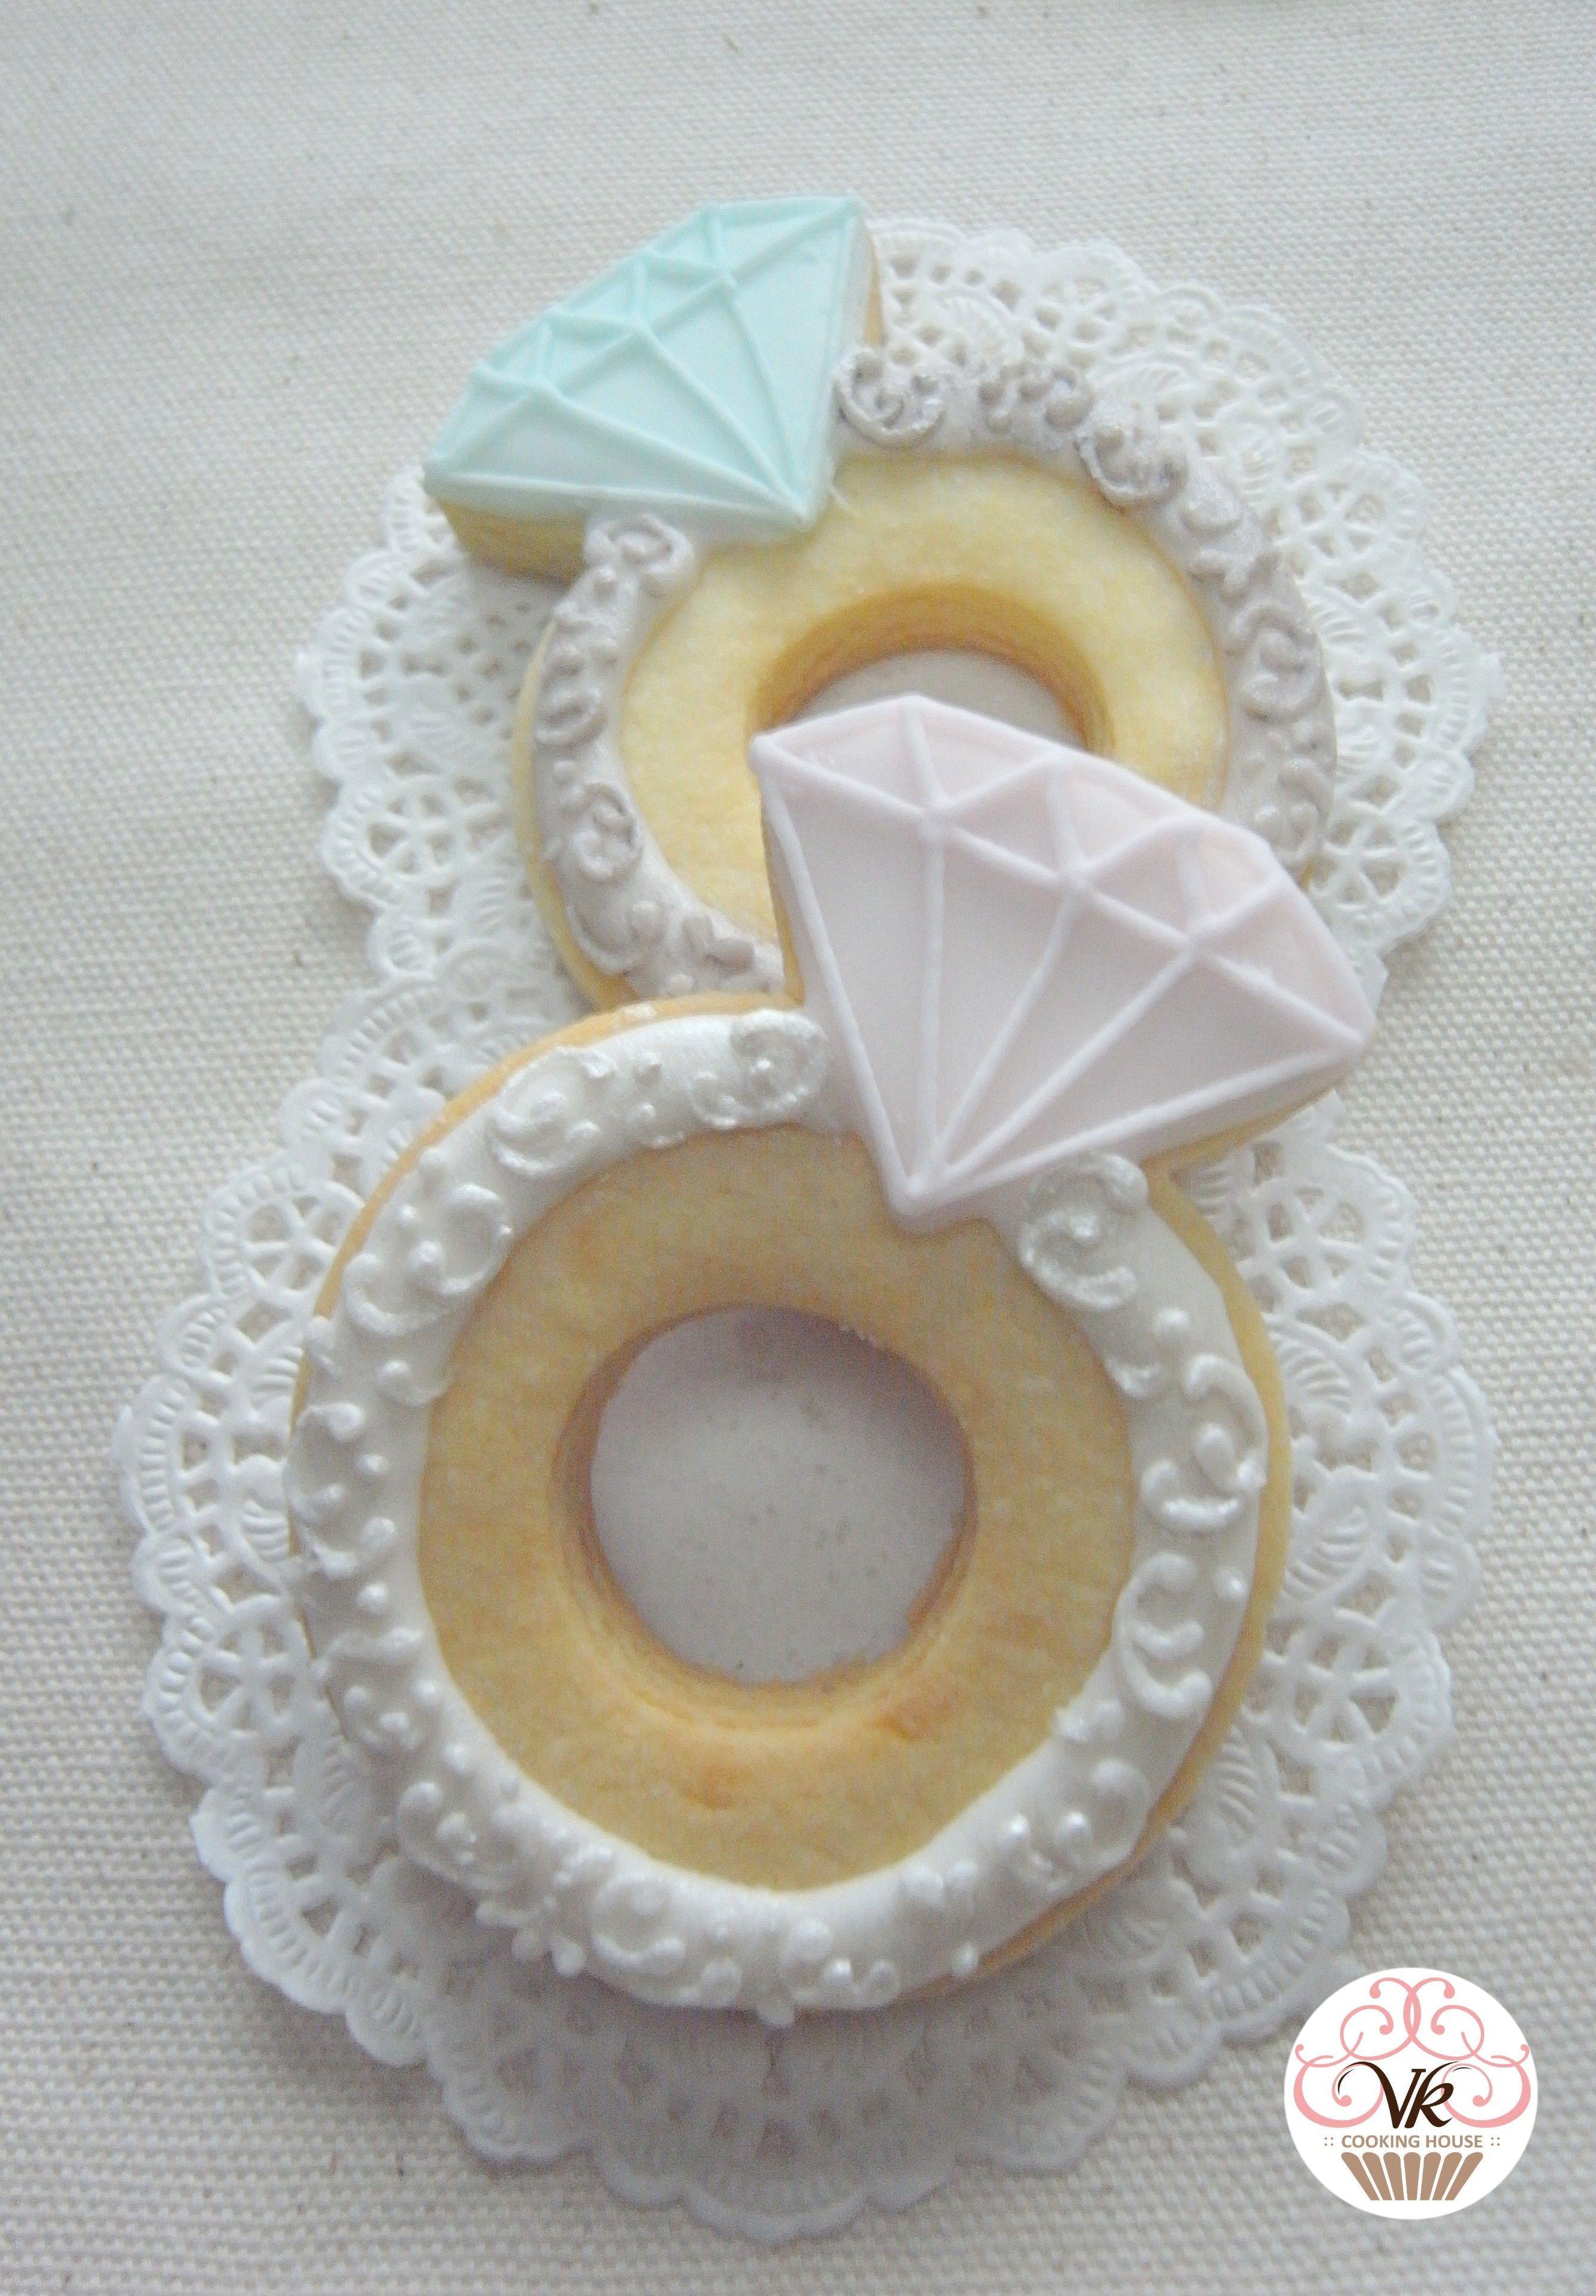 ring cookies decorated cookies